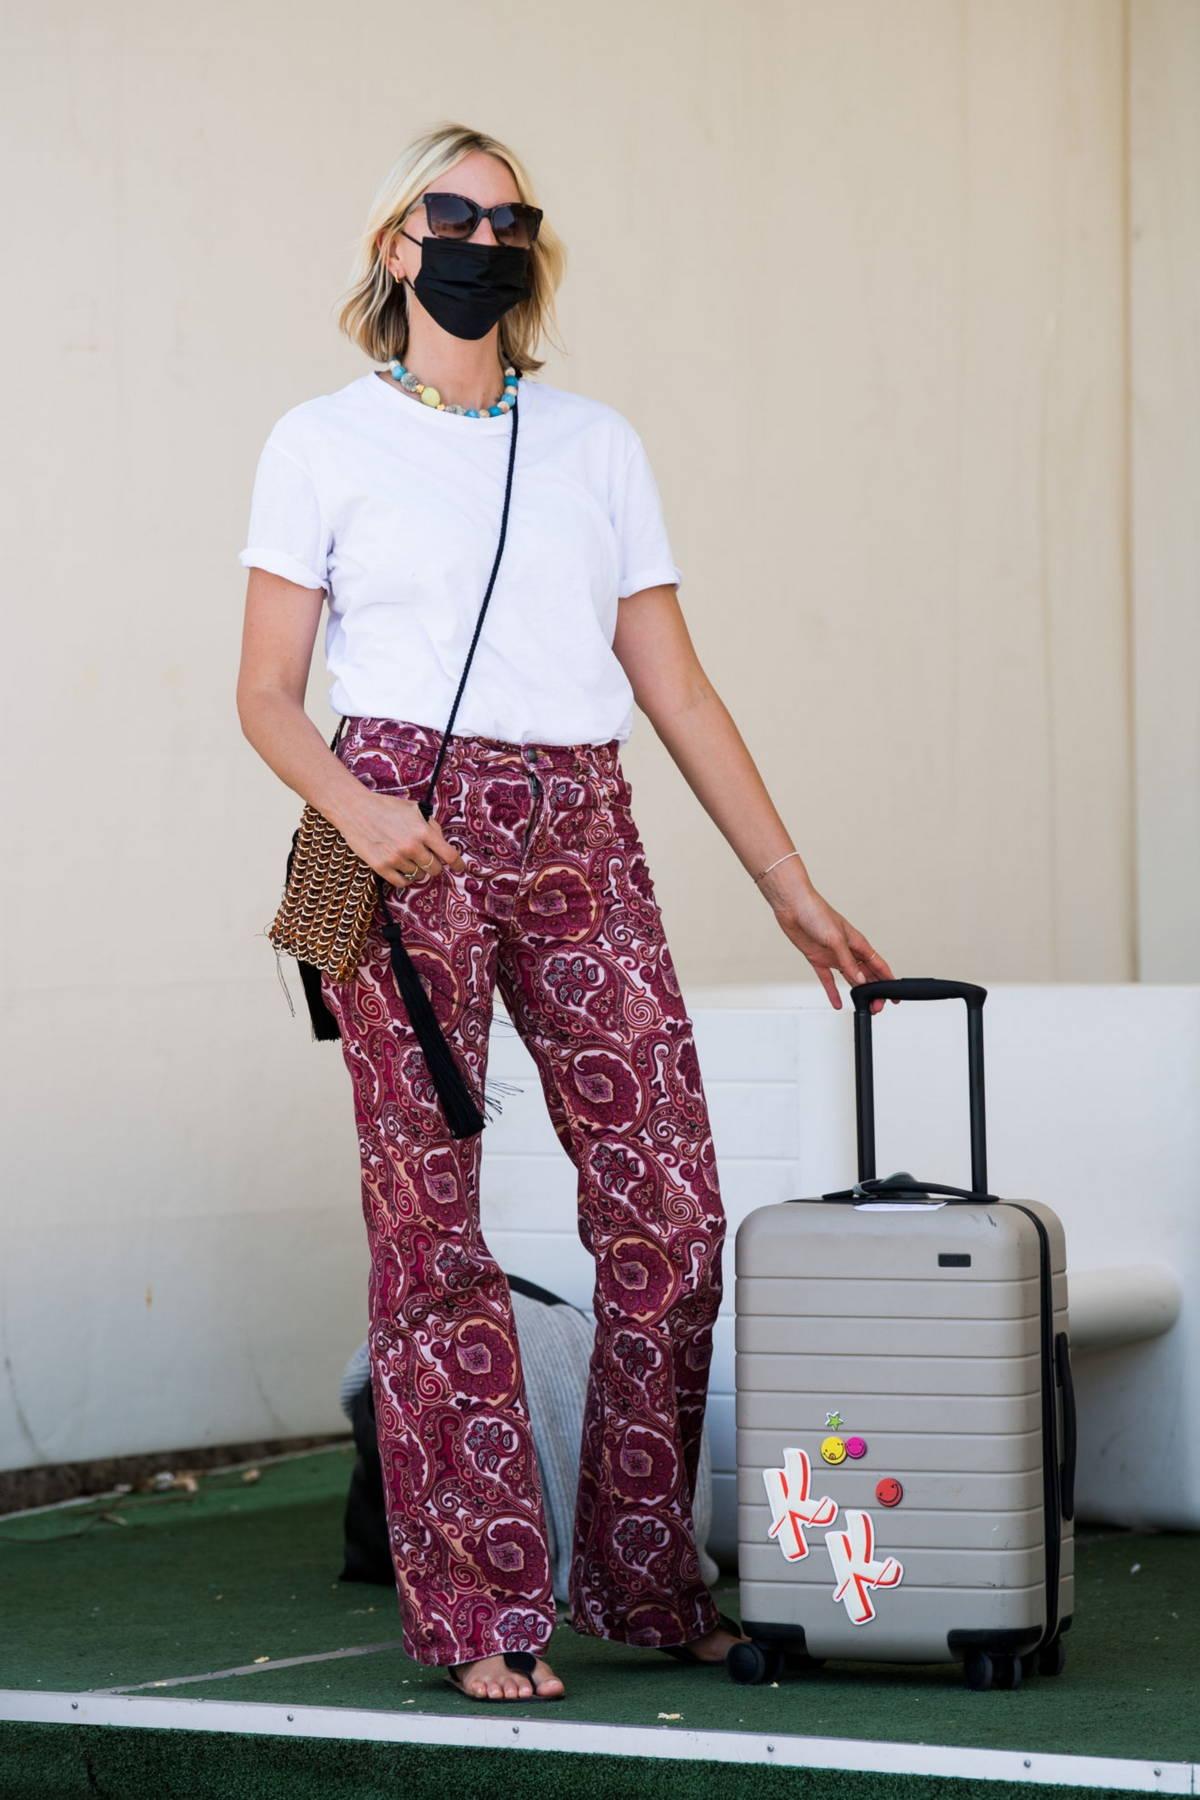 Karolina Kurkova seen arriving in Capri ahead of the UNICEF Italia and LuisaViaRoma Summer Gala in Capri, Italy